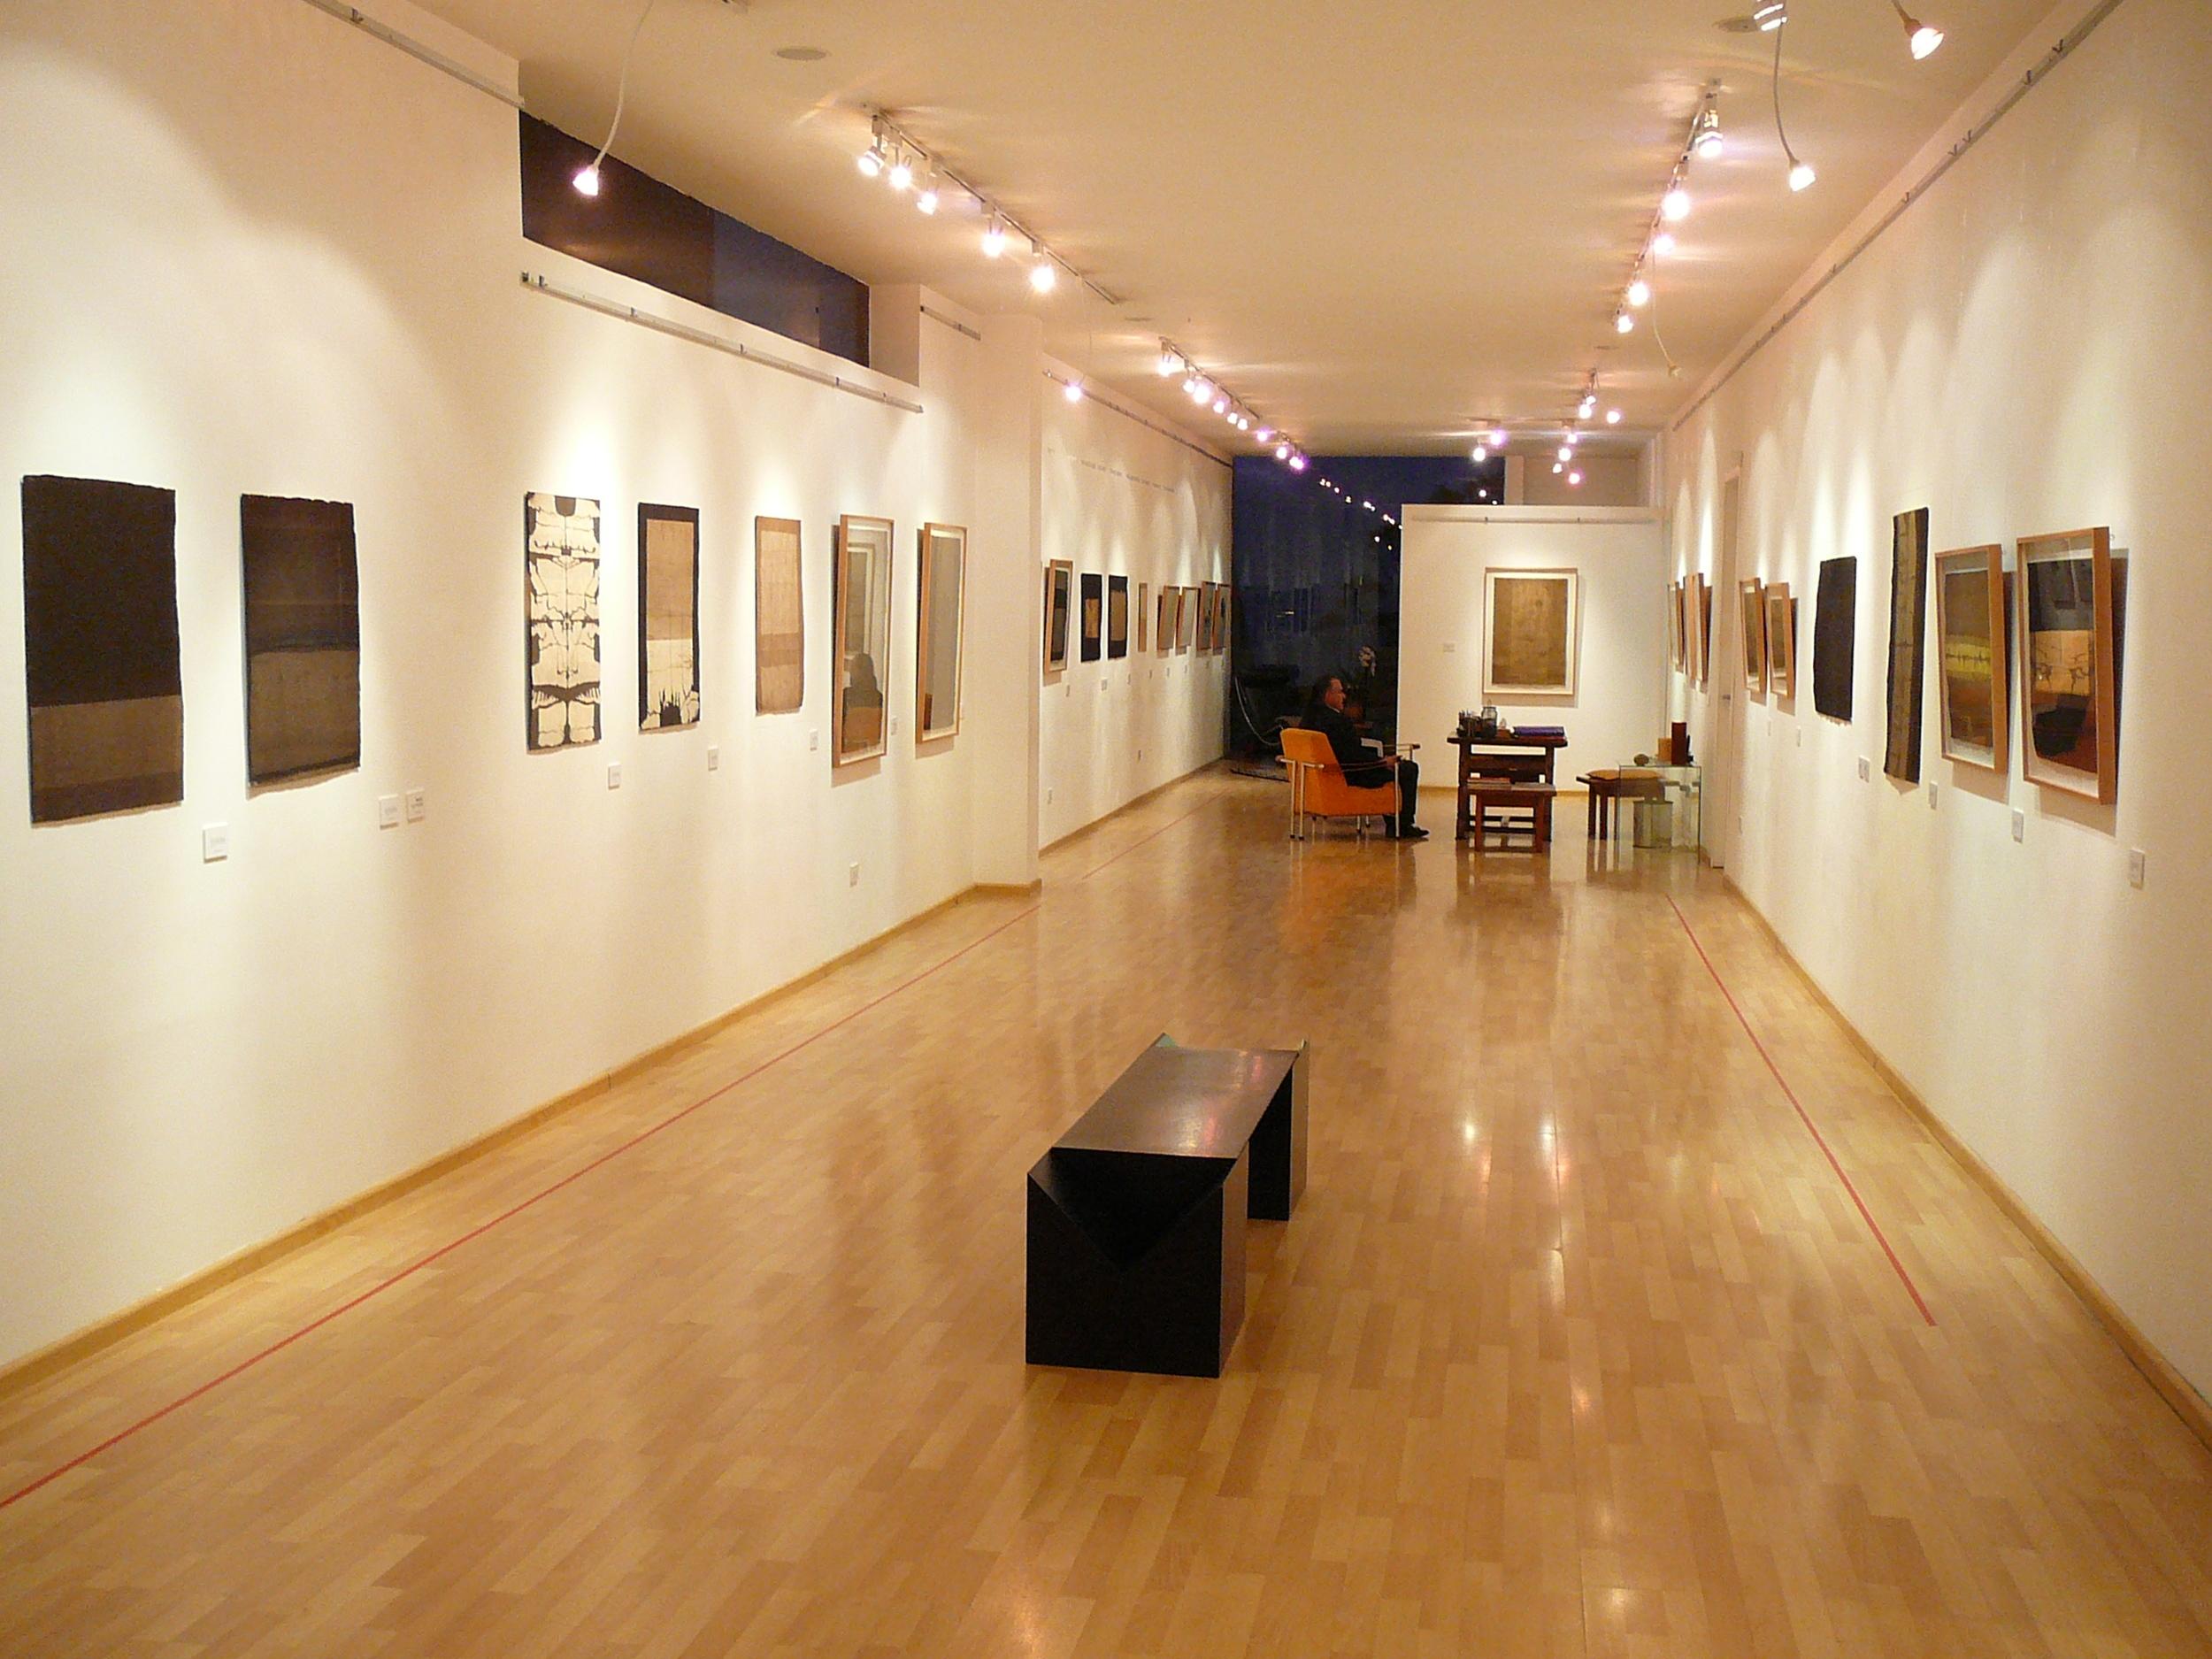 Cholango expo 2014 030 (12).JPG